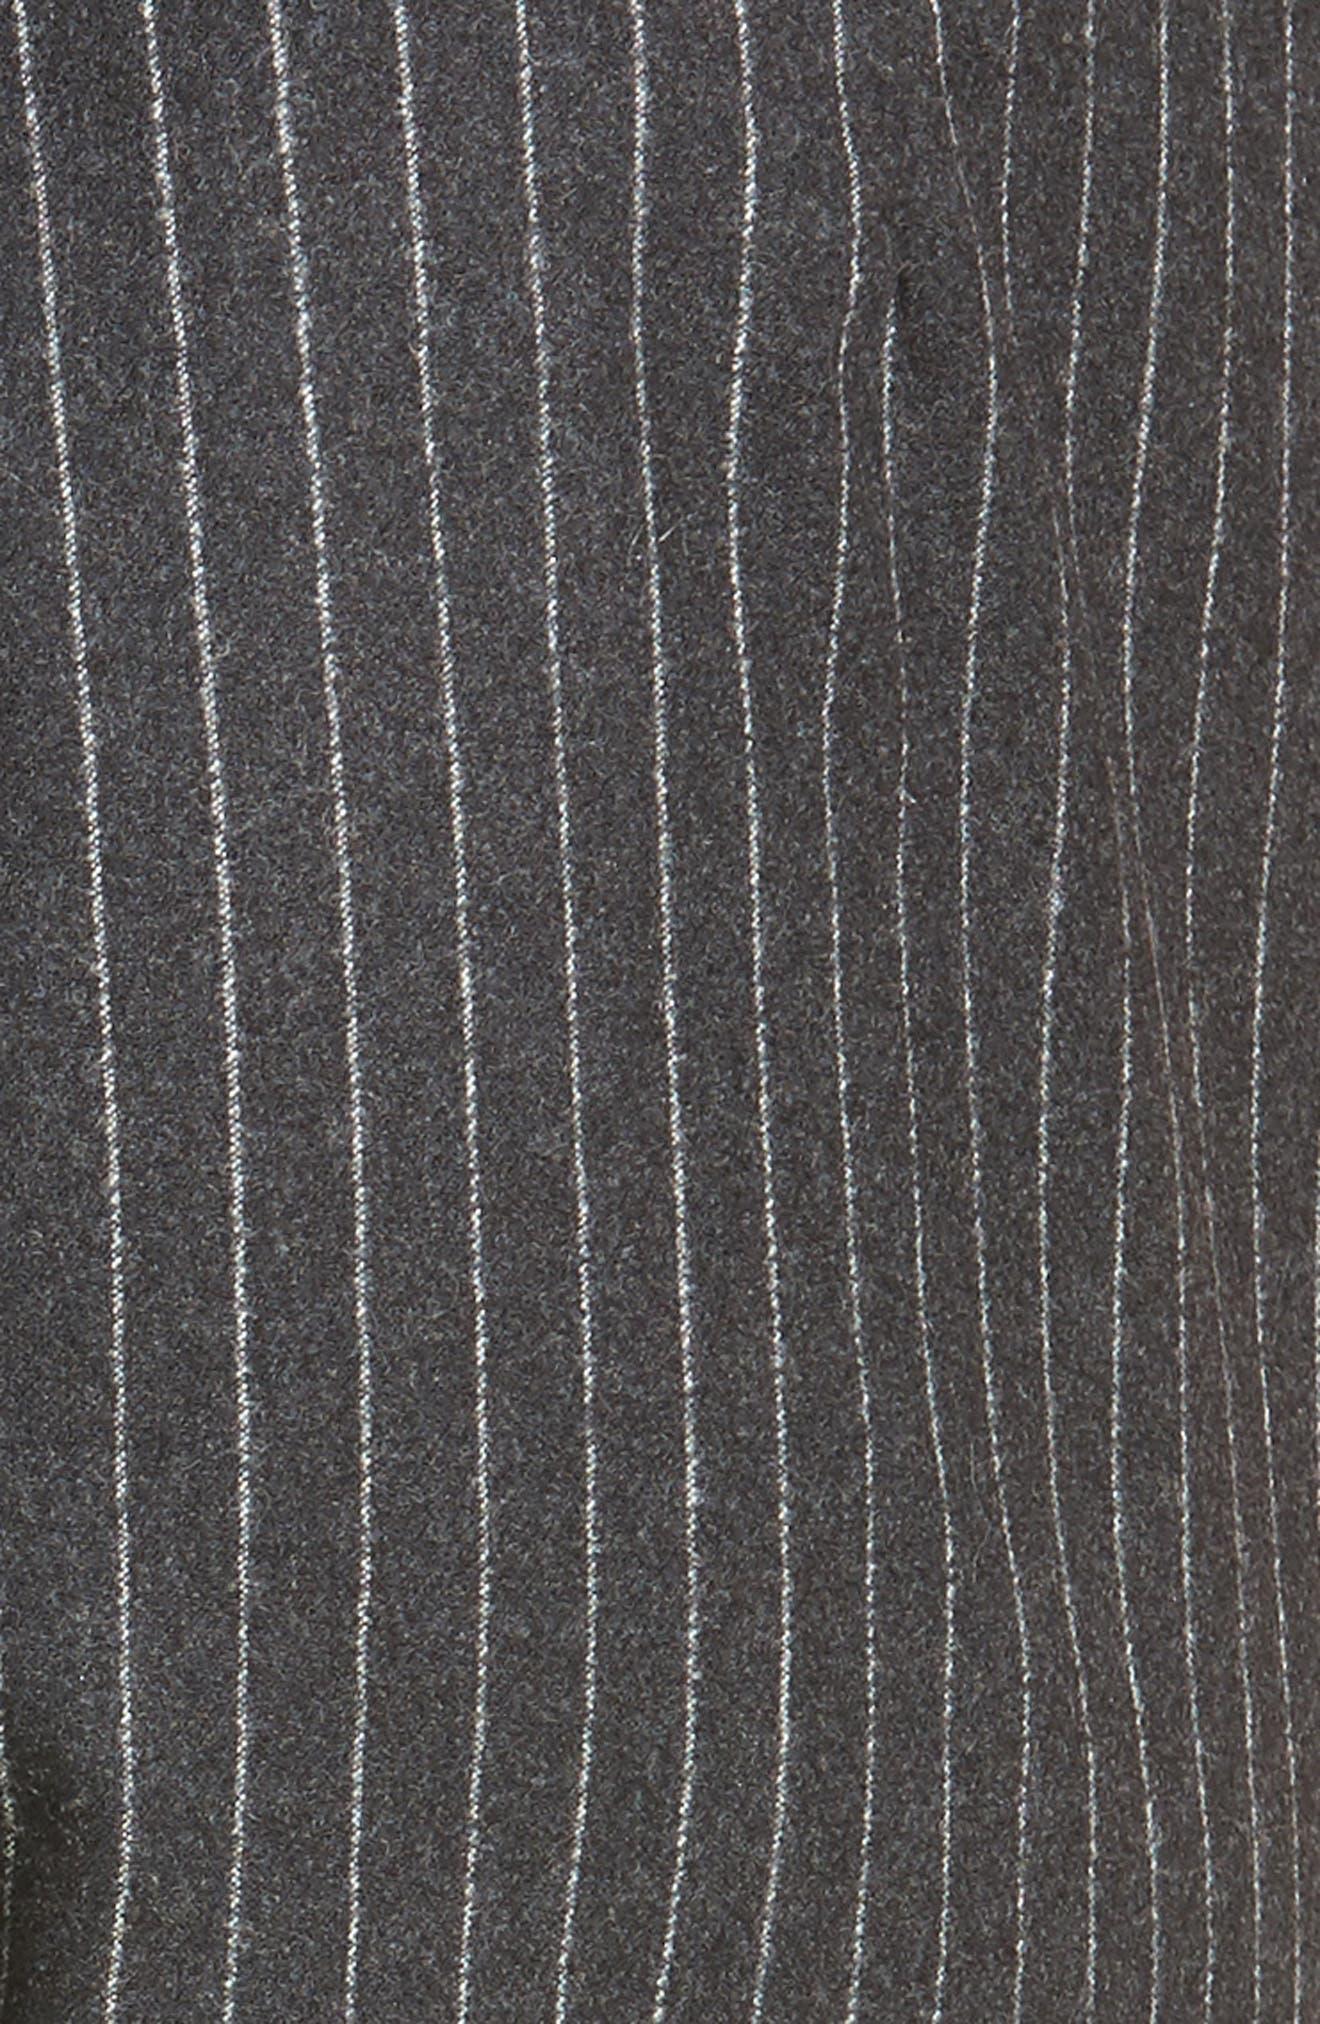 Pinstripe Wool Flannel Pants,                             Alternate thumbnail 5, color,                             021